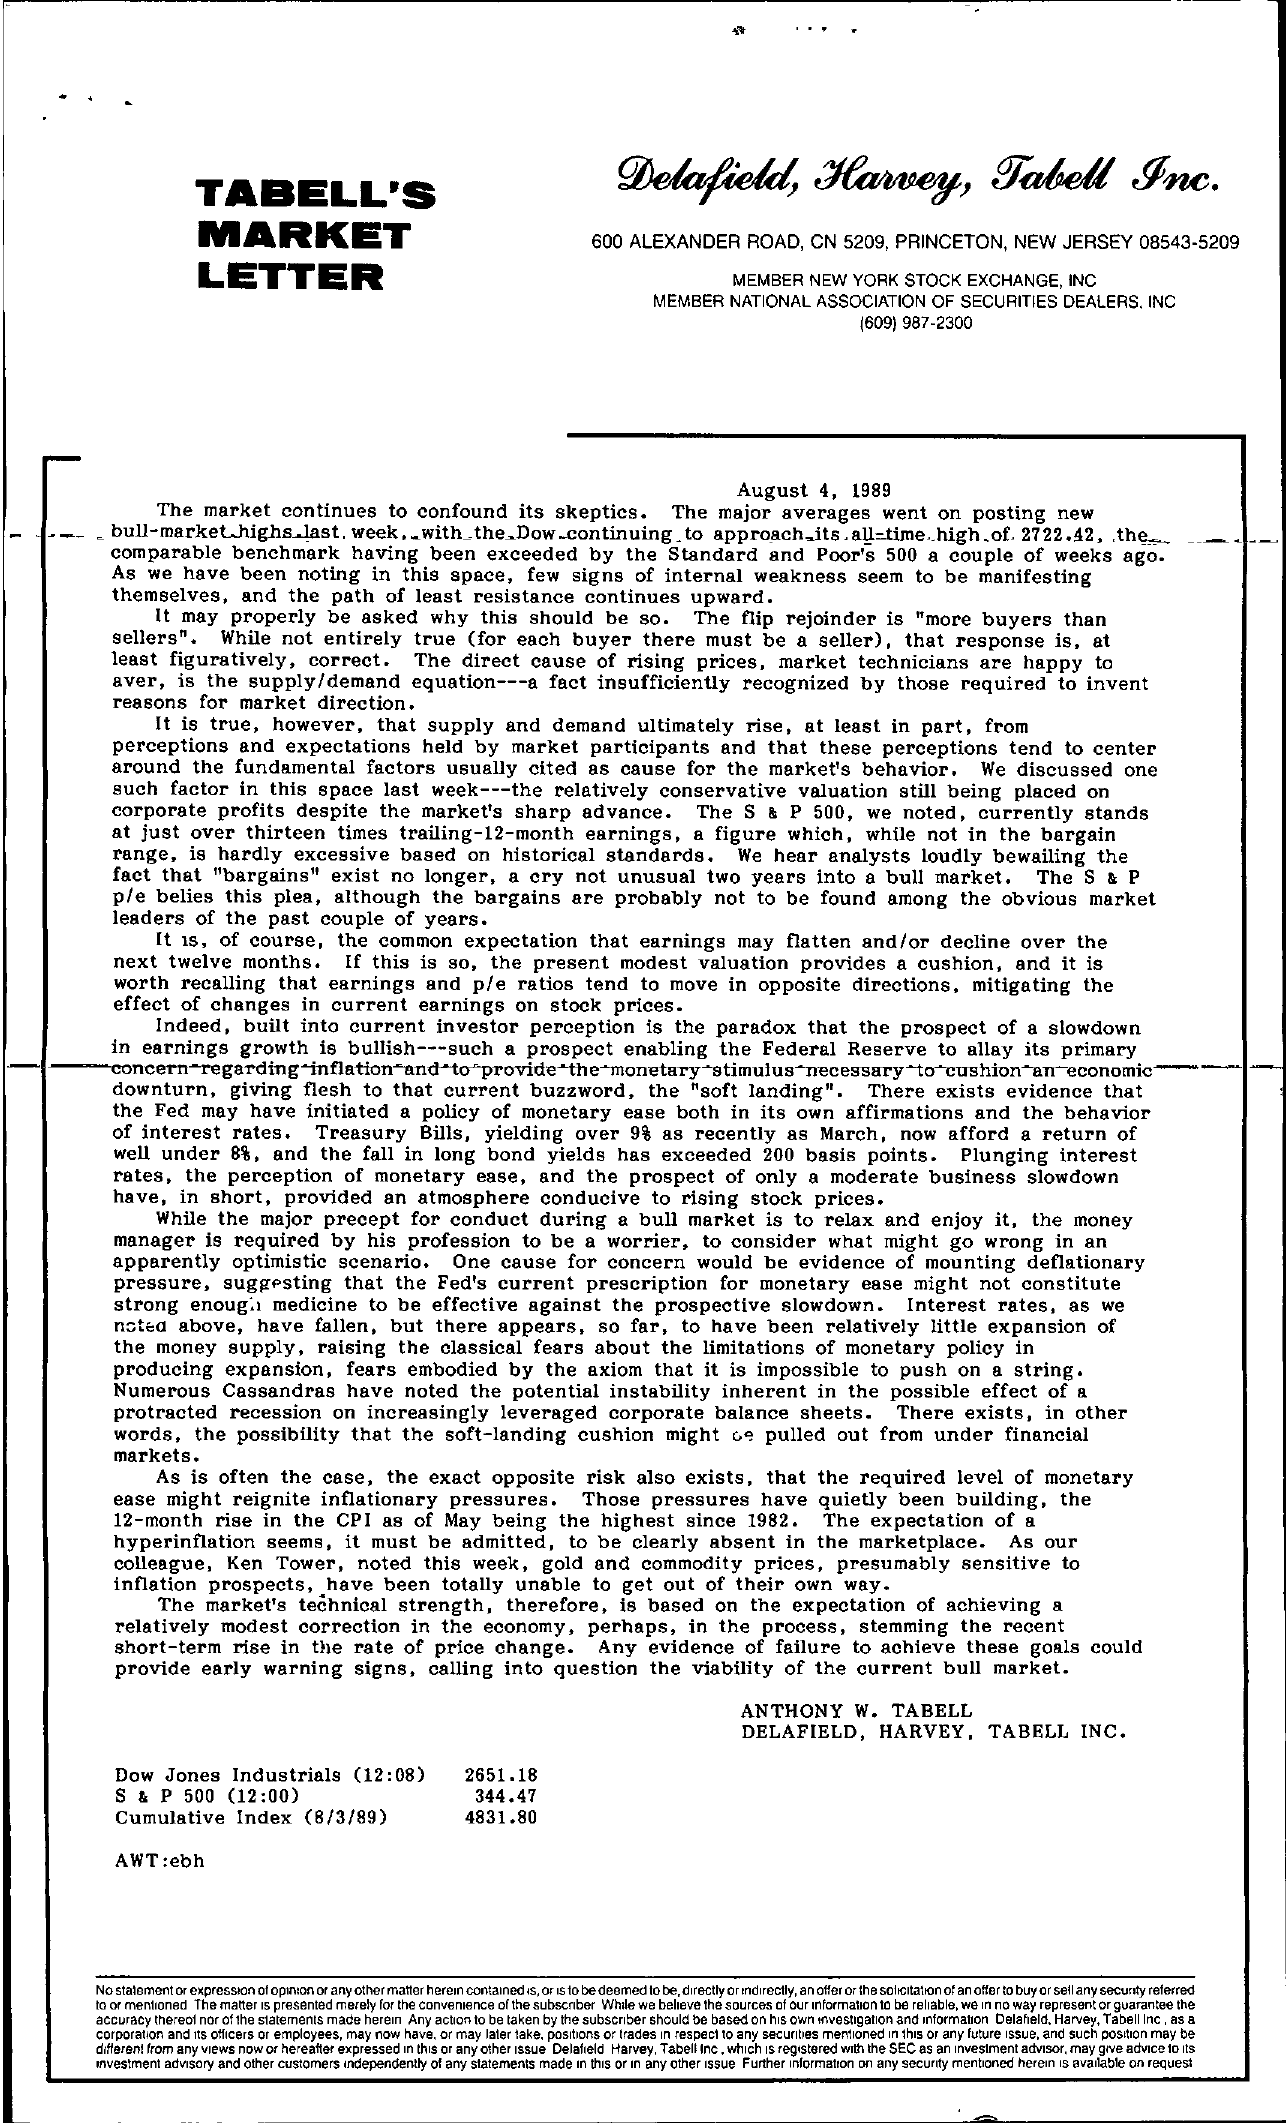 Tabell's Market Letter - August 04, 1989